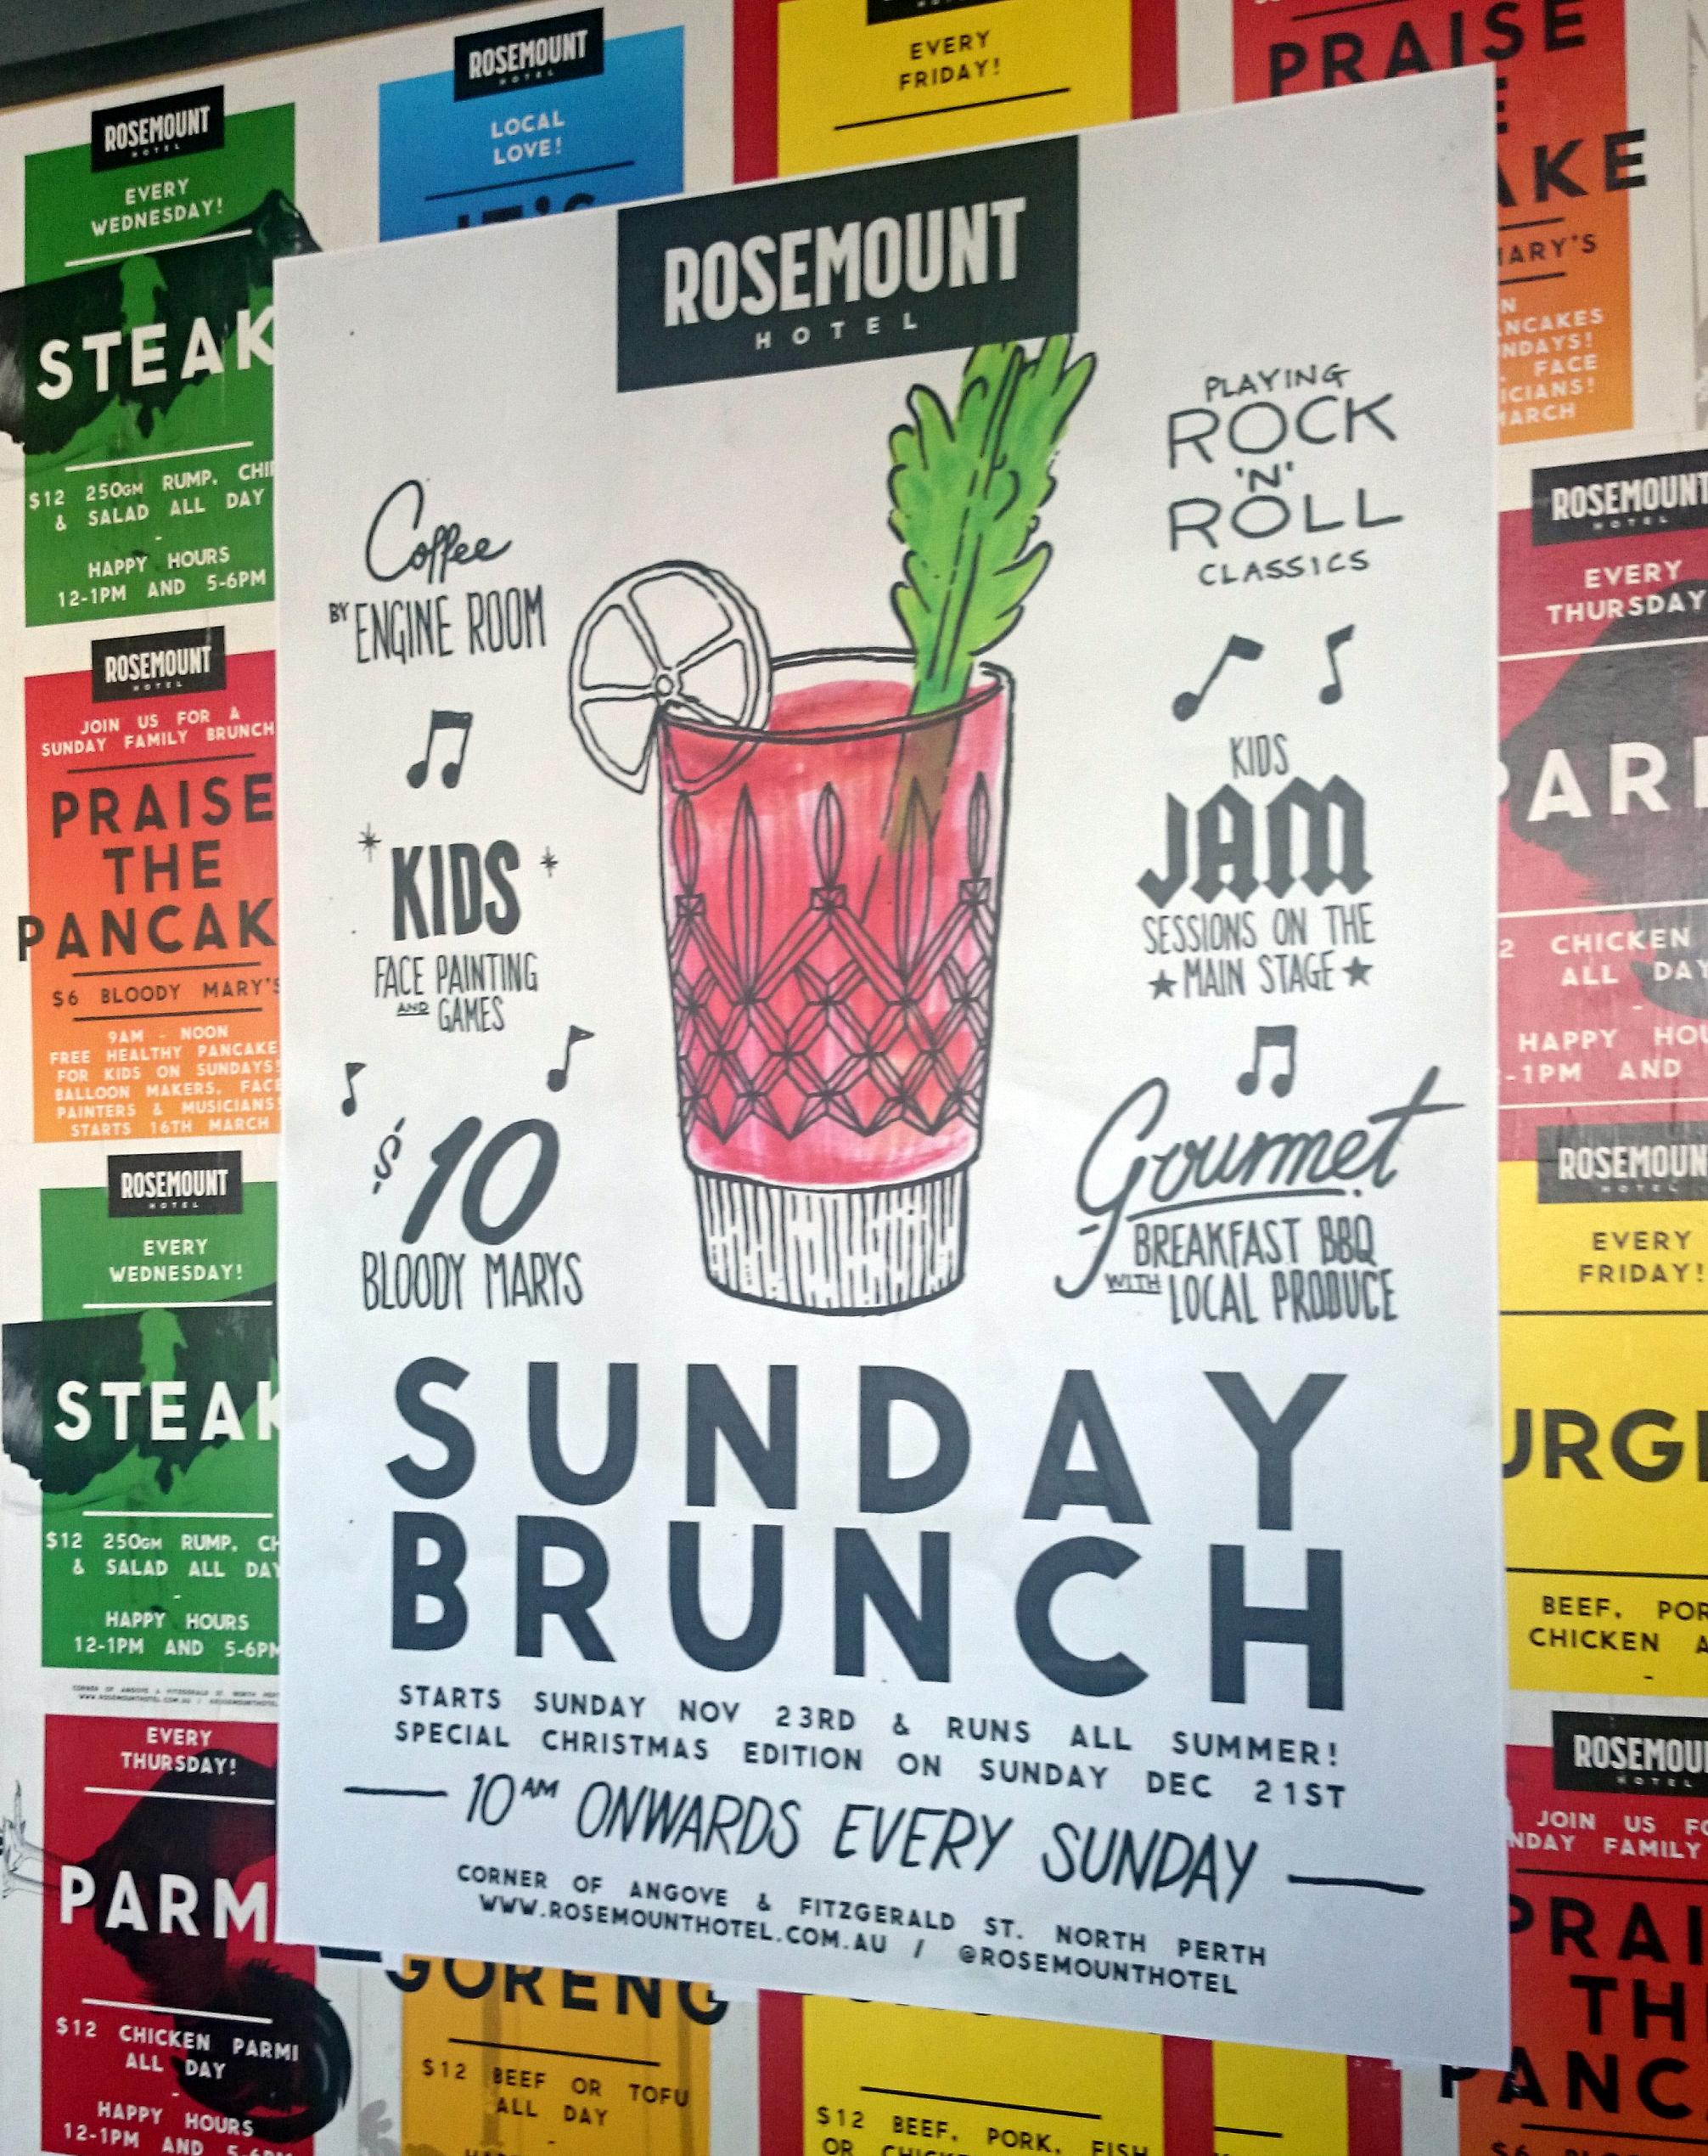 Rosemount-hotel-brunch-poster brunch review Agent Mystery Case